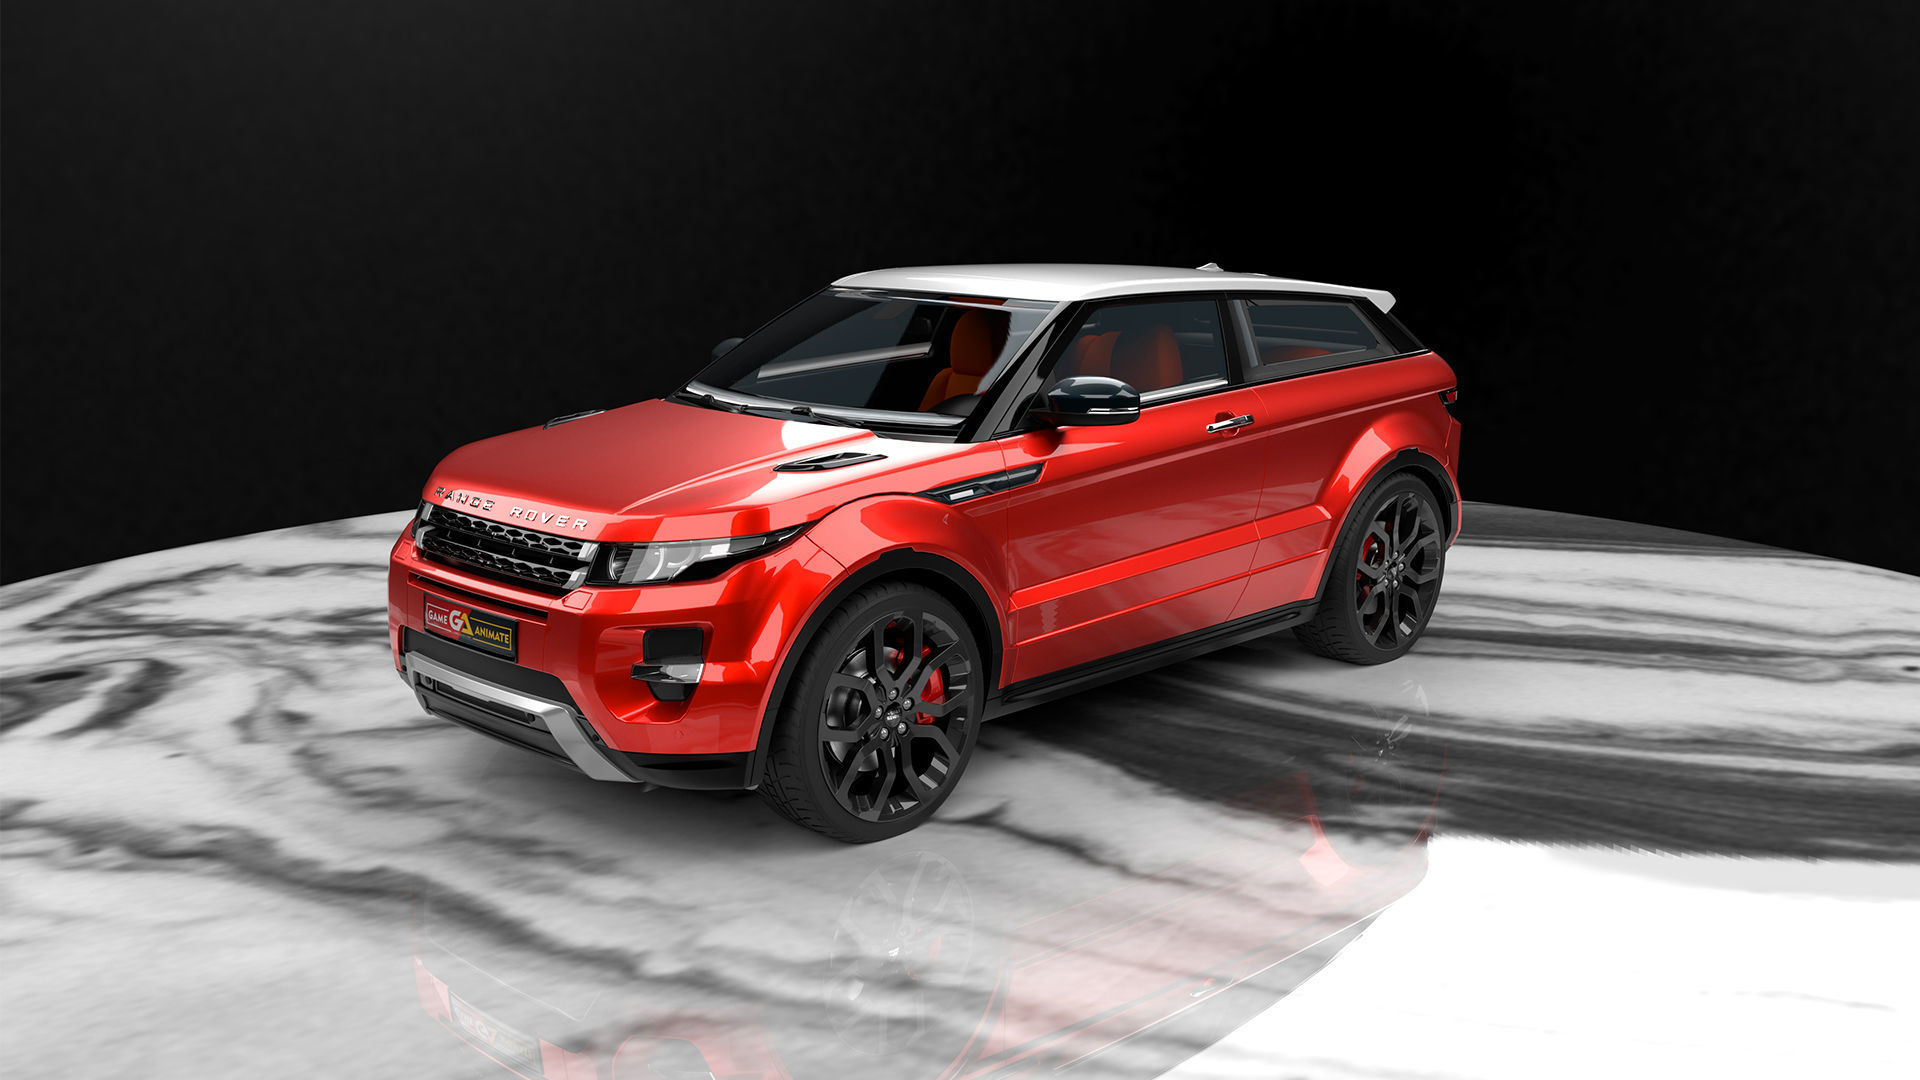 Range Rover Evoque  Realistic 3D Car Model